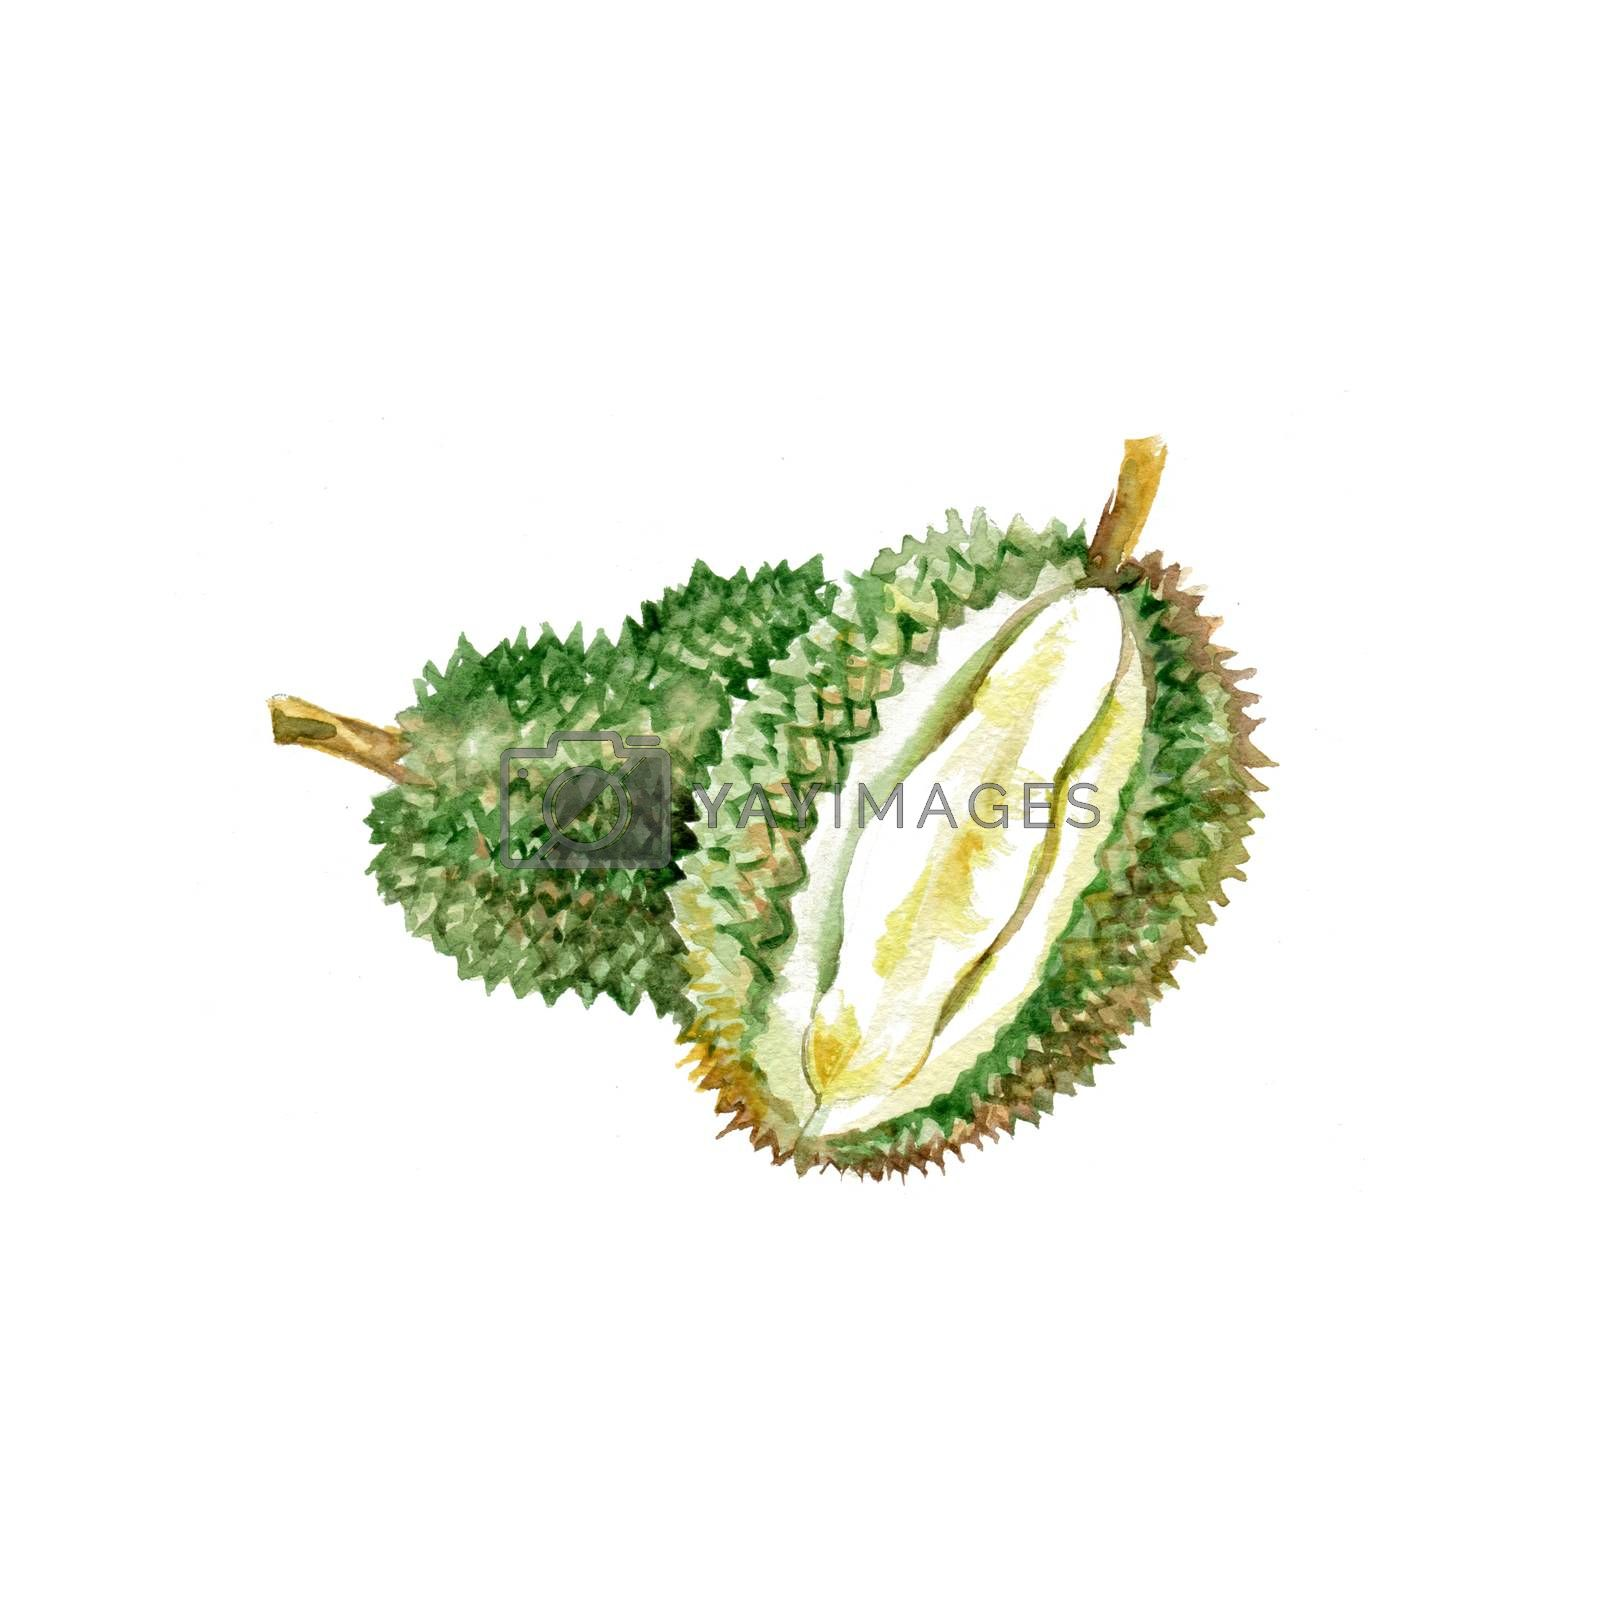 Watercolor Durian. Hand Drawn Illustration Organic Food Vegetarian Ingredient